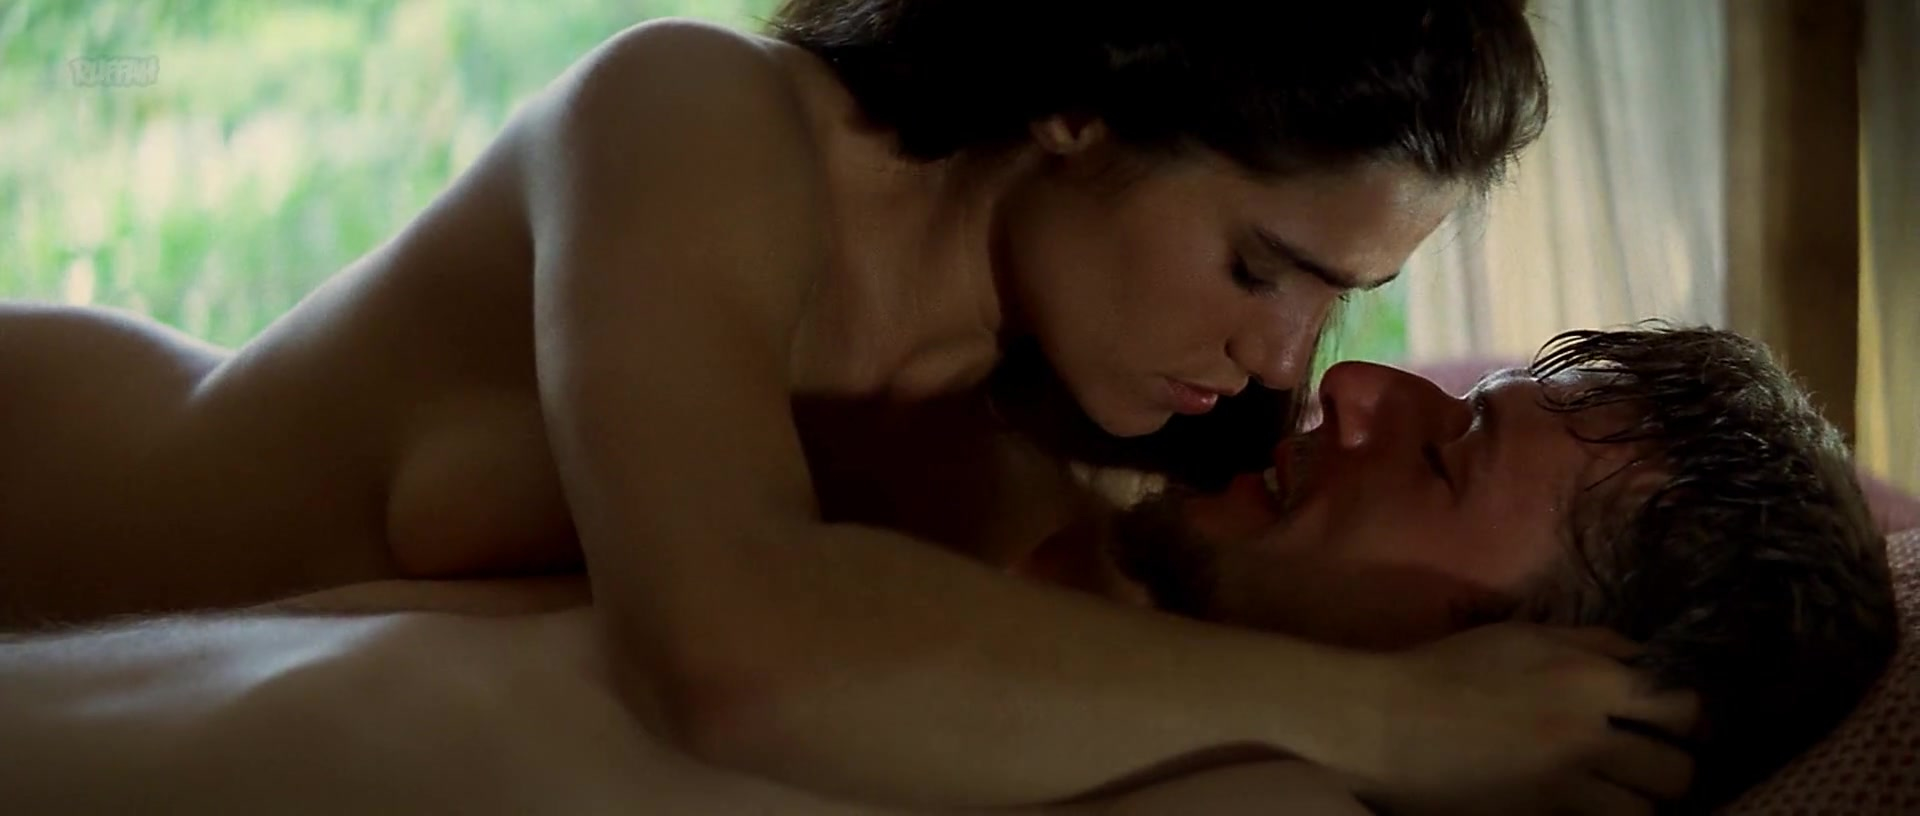 gaberiela-roel-nude